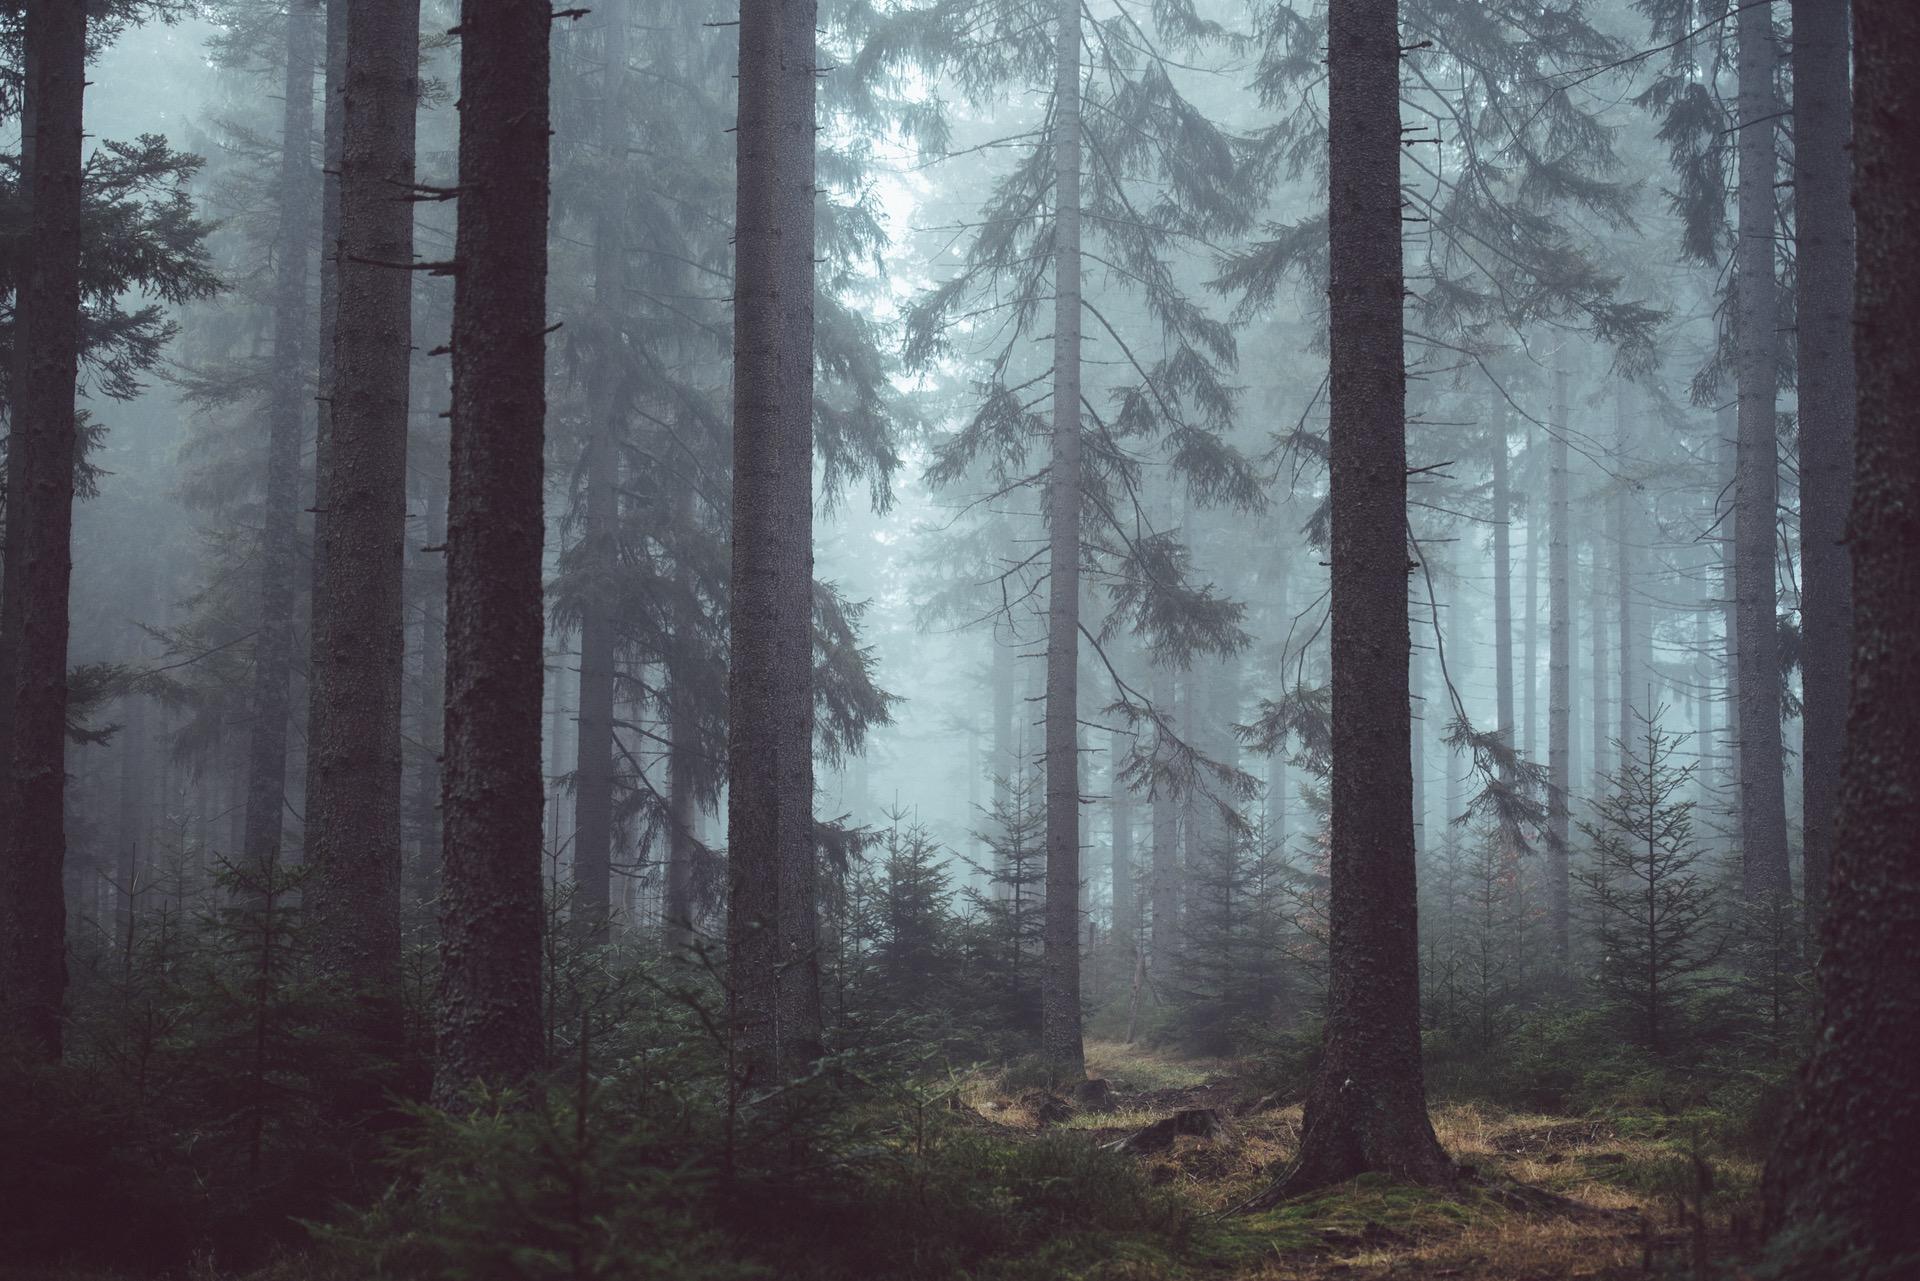 Sarsaparilla likes dark, humid forests like this